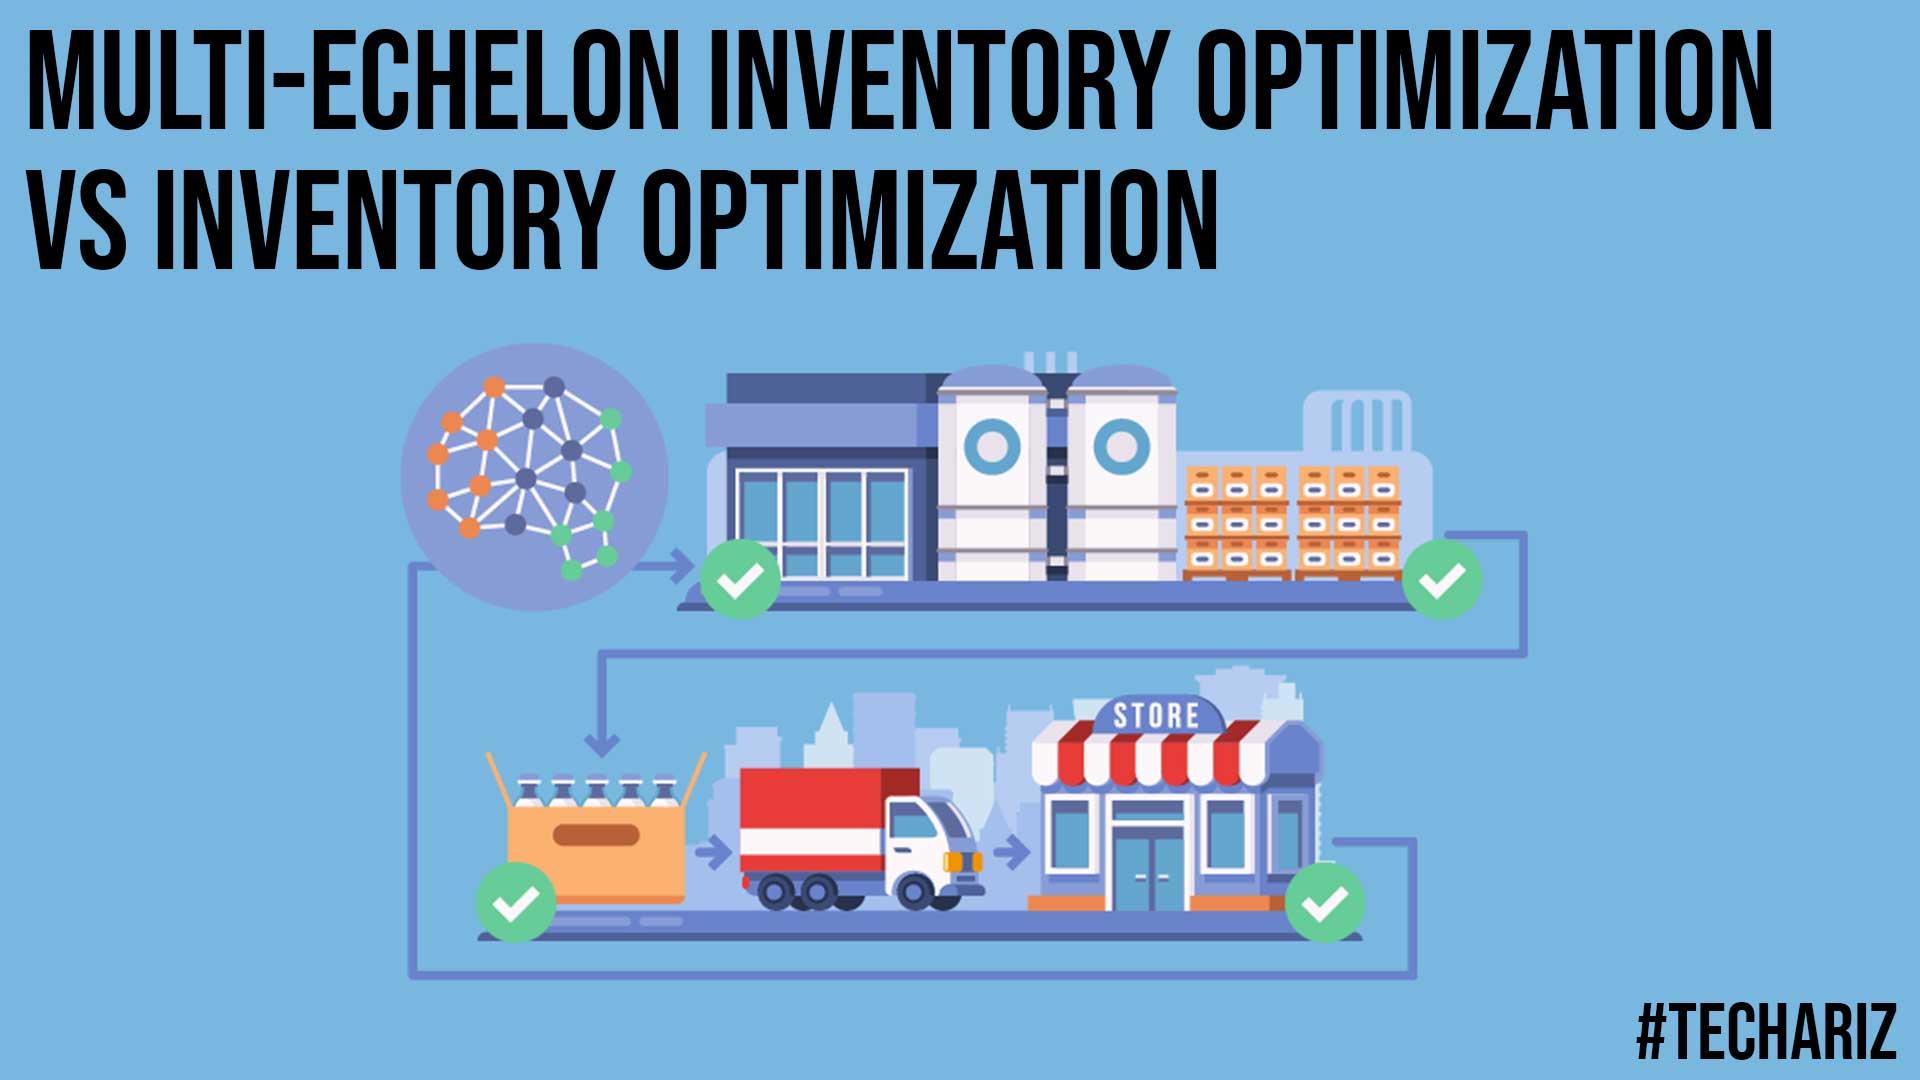 Multi echelon Inventory Optimization vs Inventory Optimization